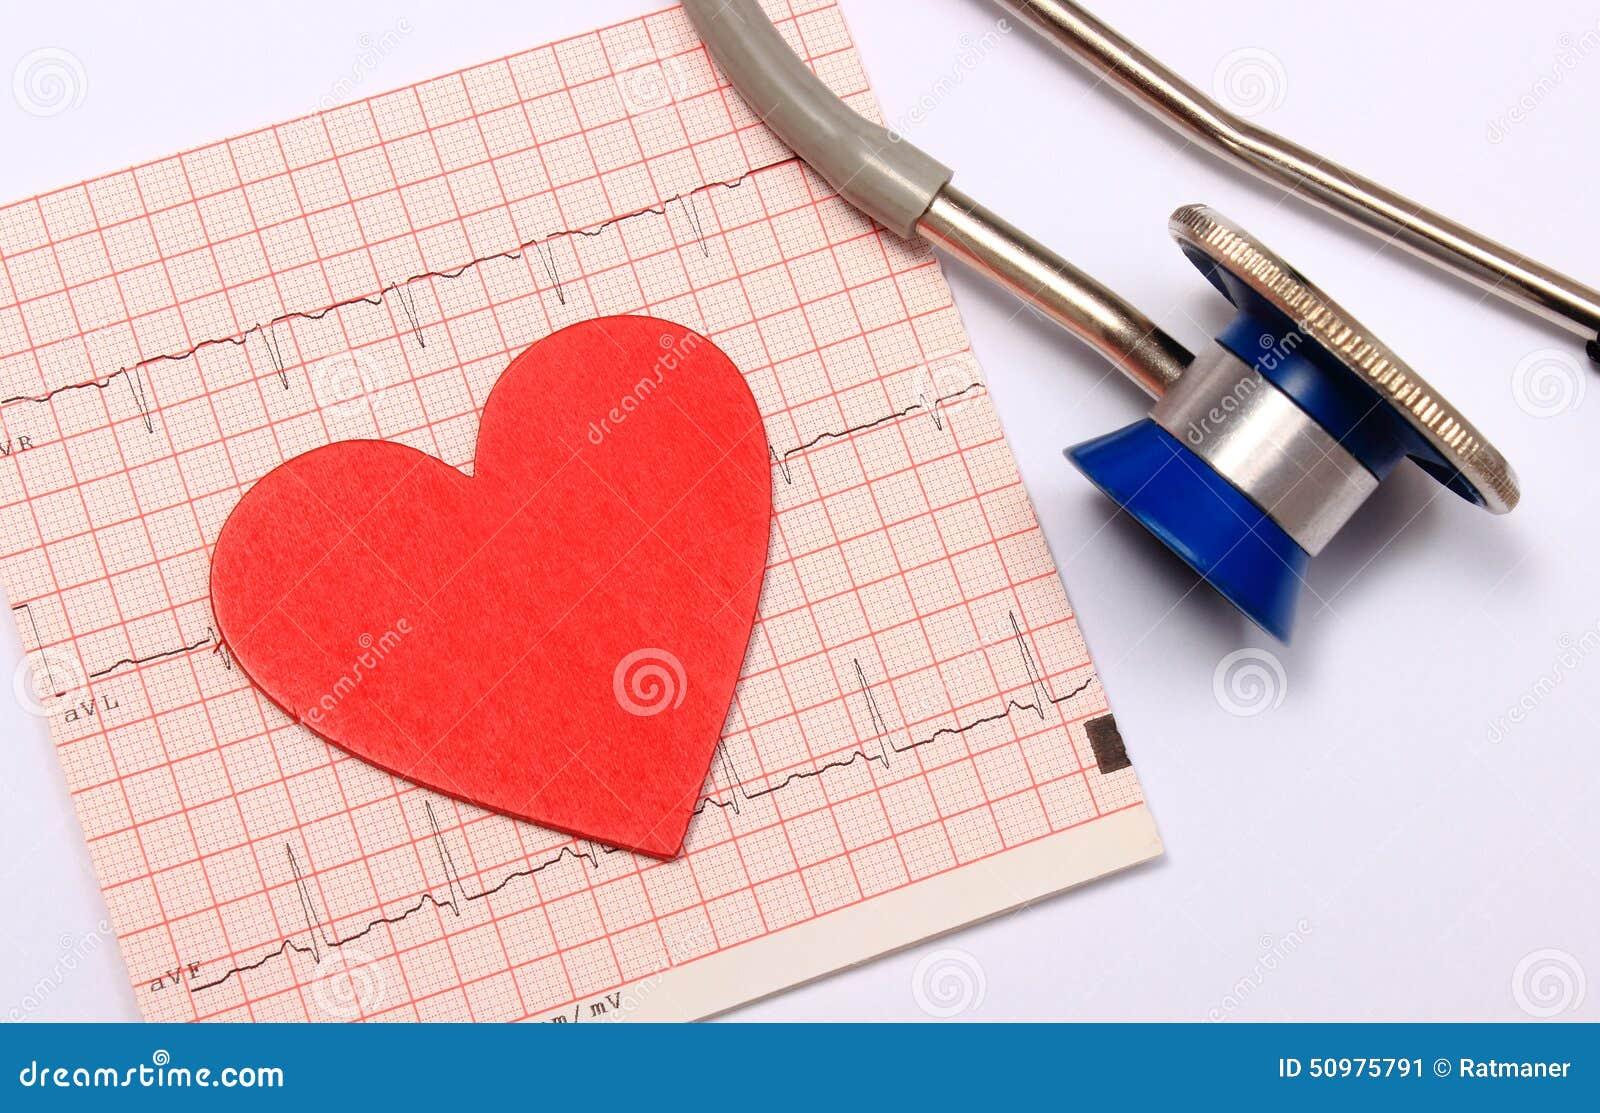 Stethoscope Electrocardiogram Graph Report Heart Shape Medical Ekg Rhythm Medicine Concept Illustrations Royalty Free